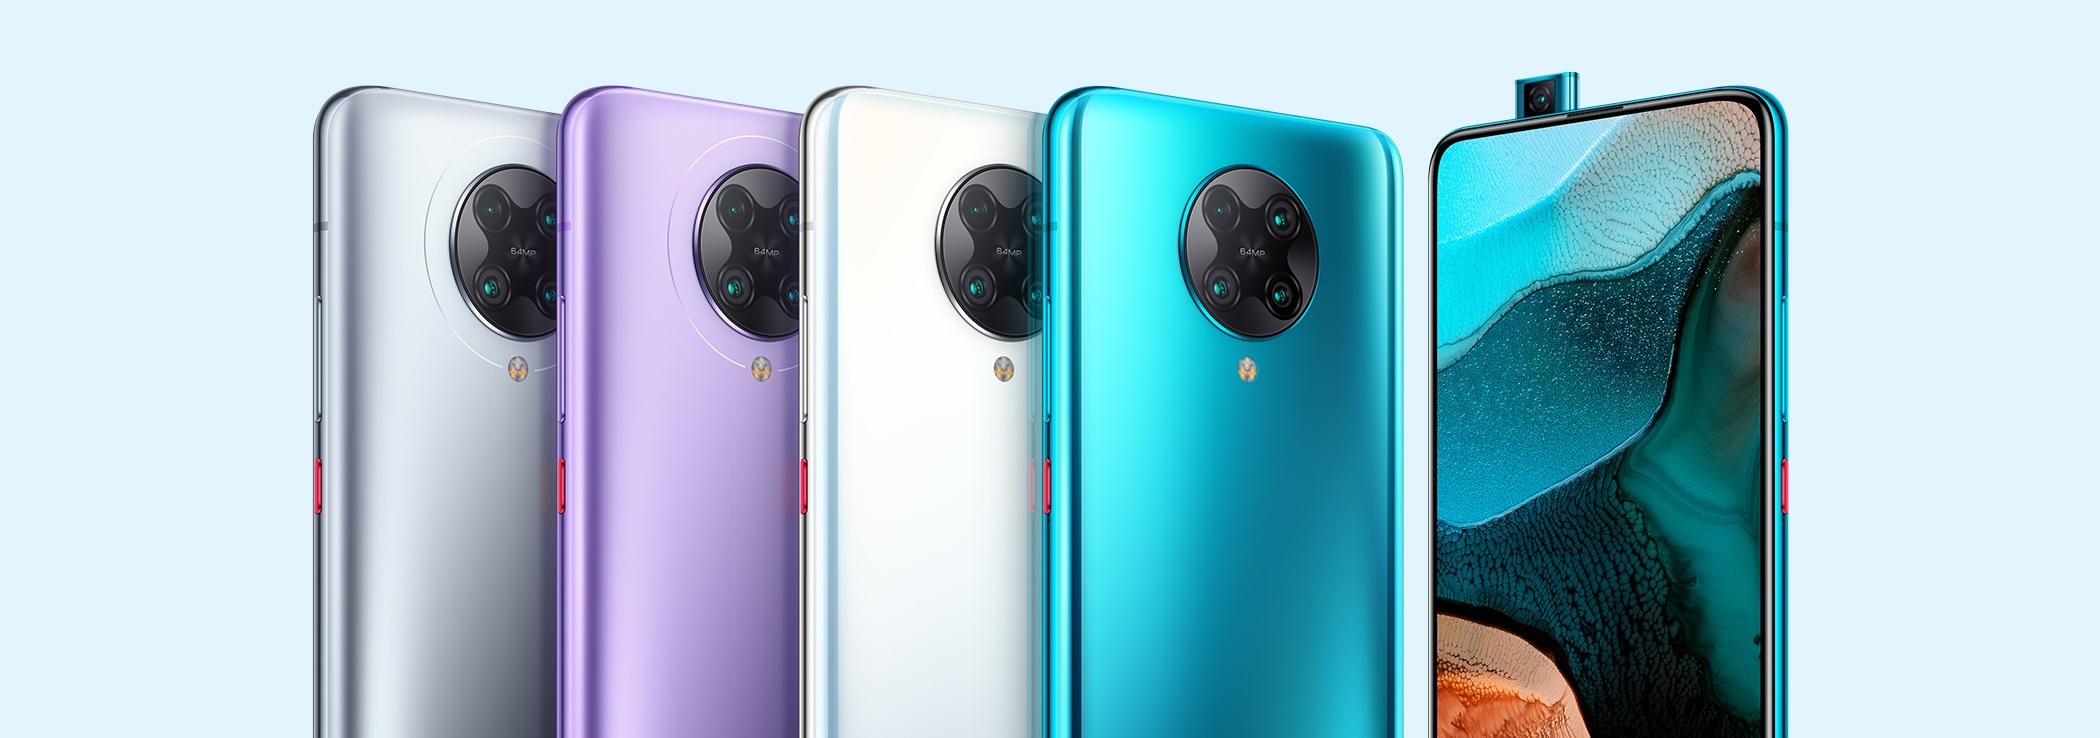 Redmi K30 Pro smartphone